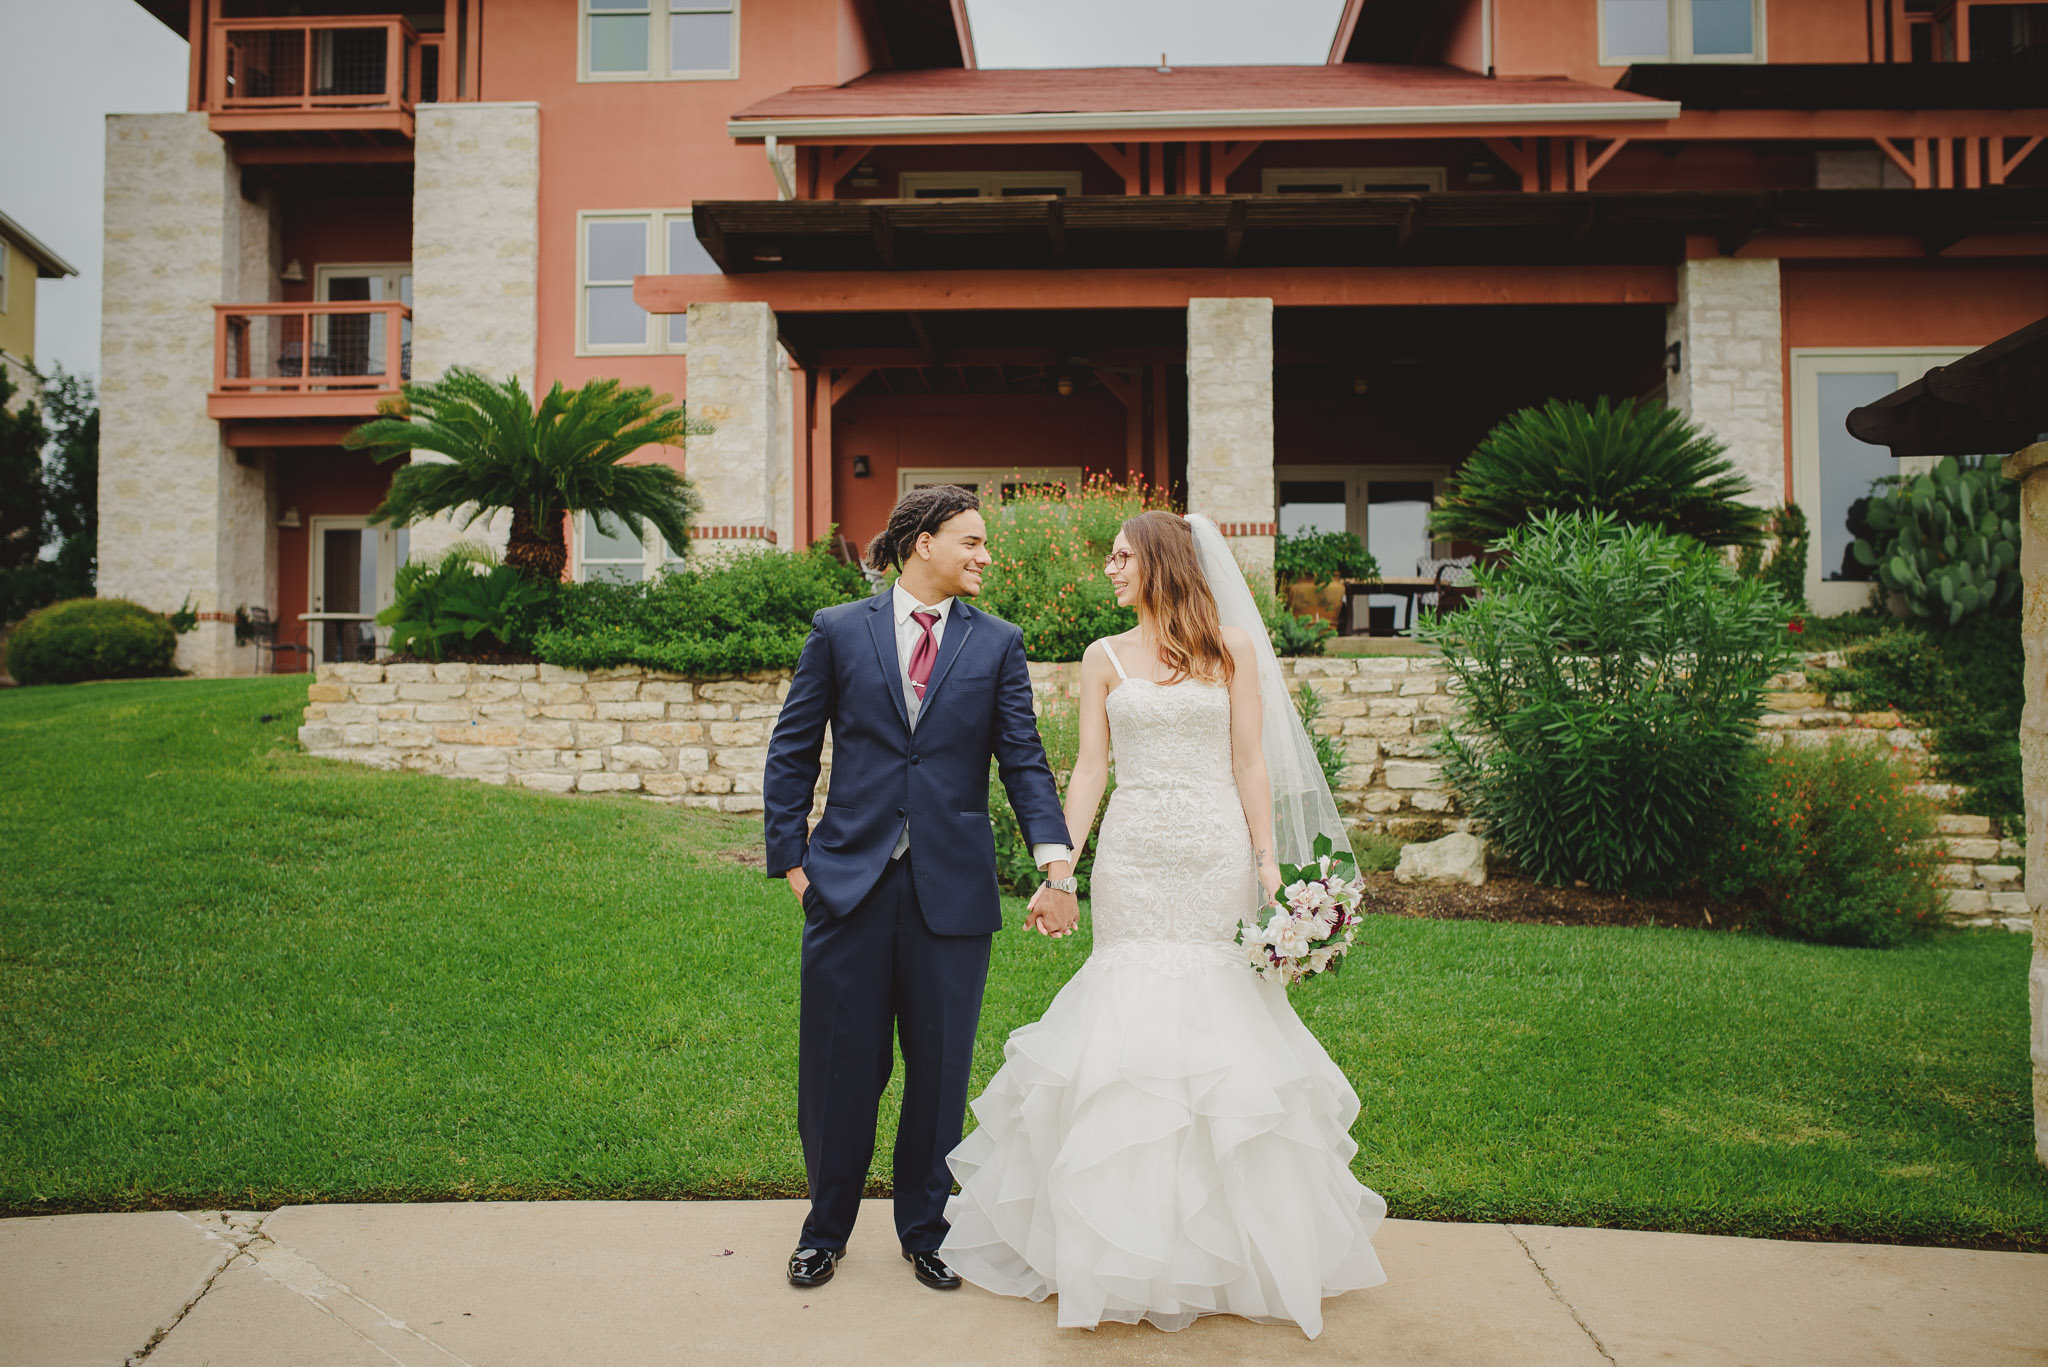 Austin-Texas-Wedding-Vintage-Villas-0051.jpg